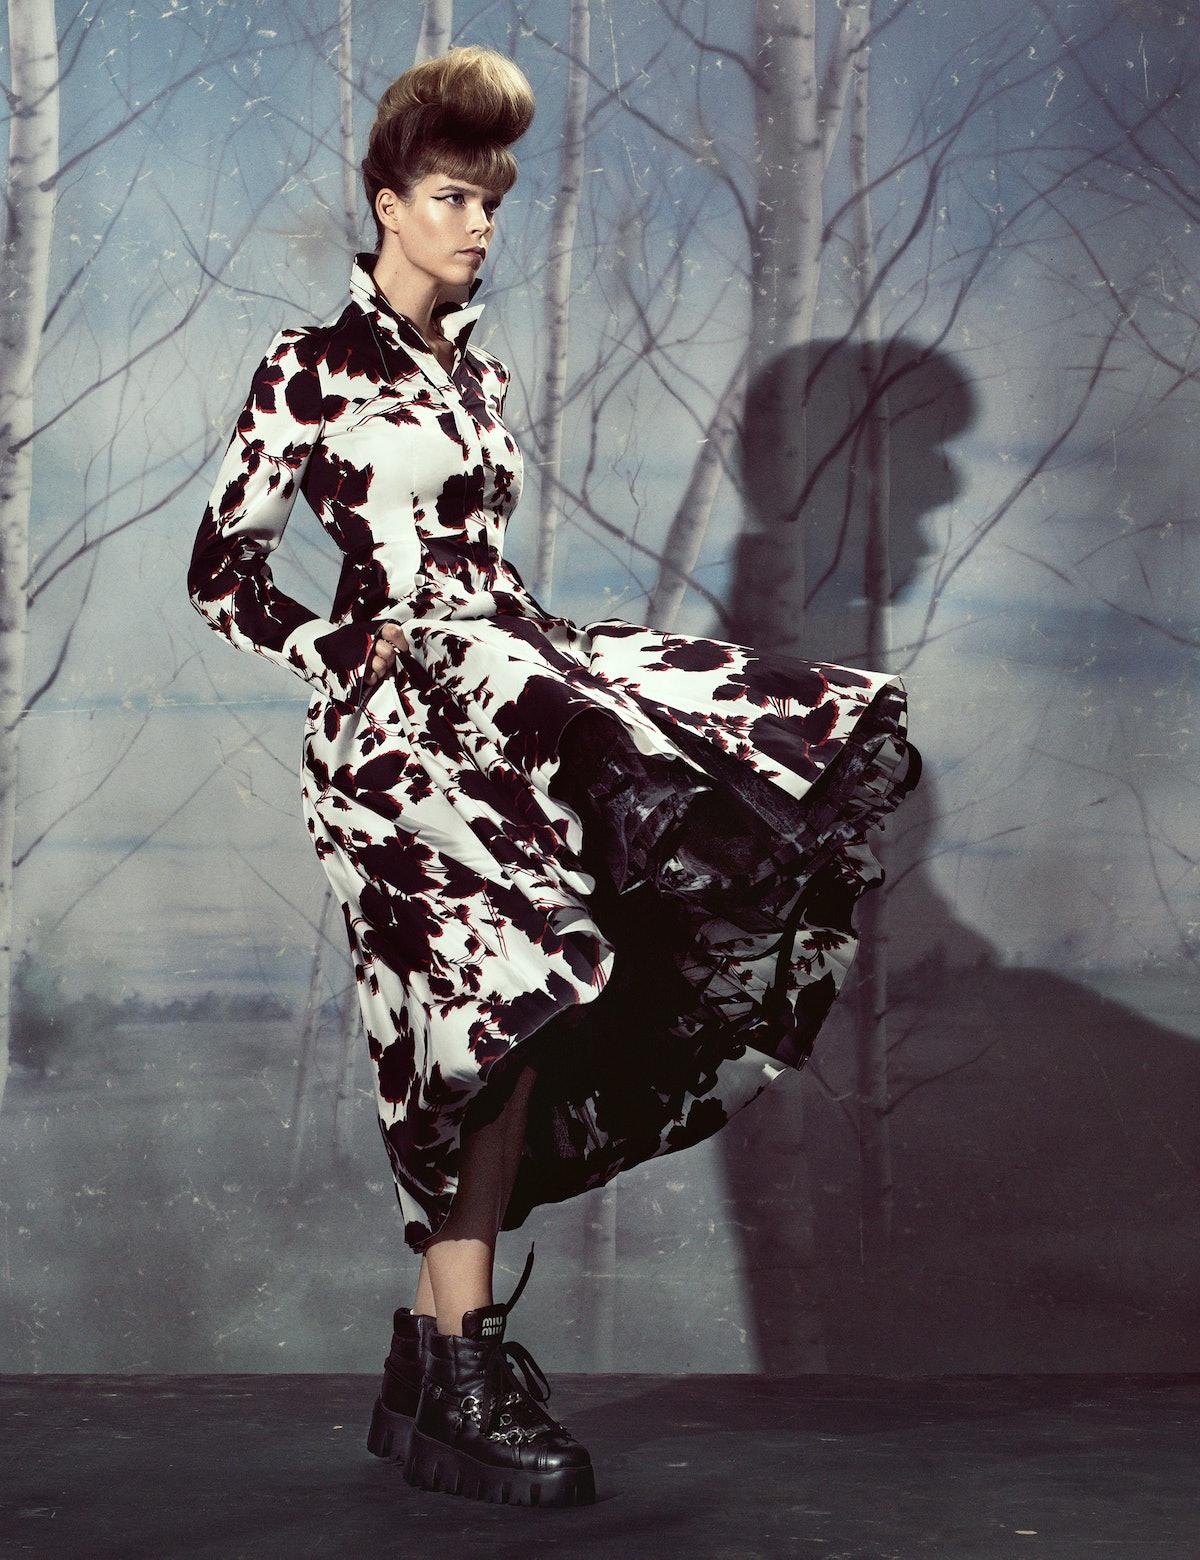 Meghan Collison wears an Erdem dress; Miu Miu boots; stylist's own crinoline.